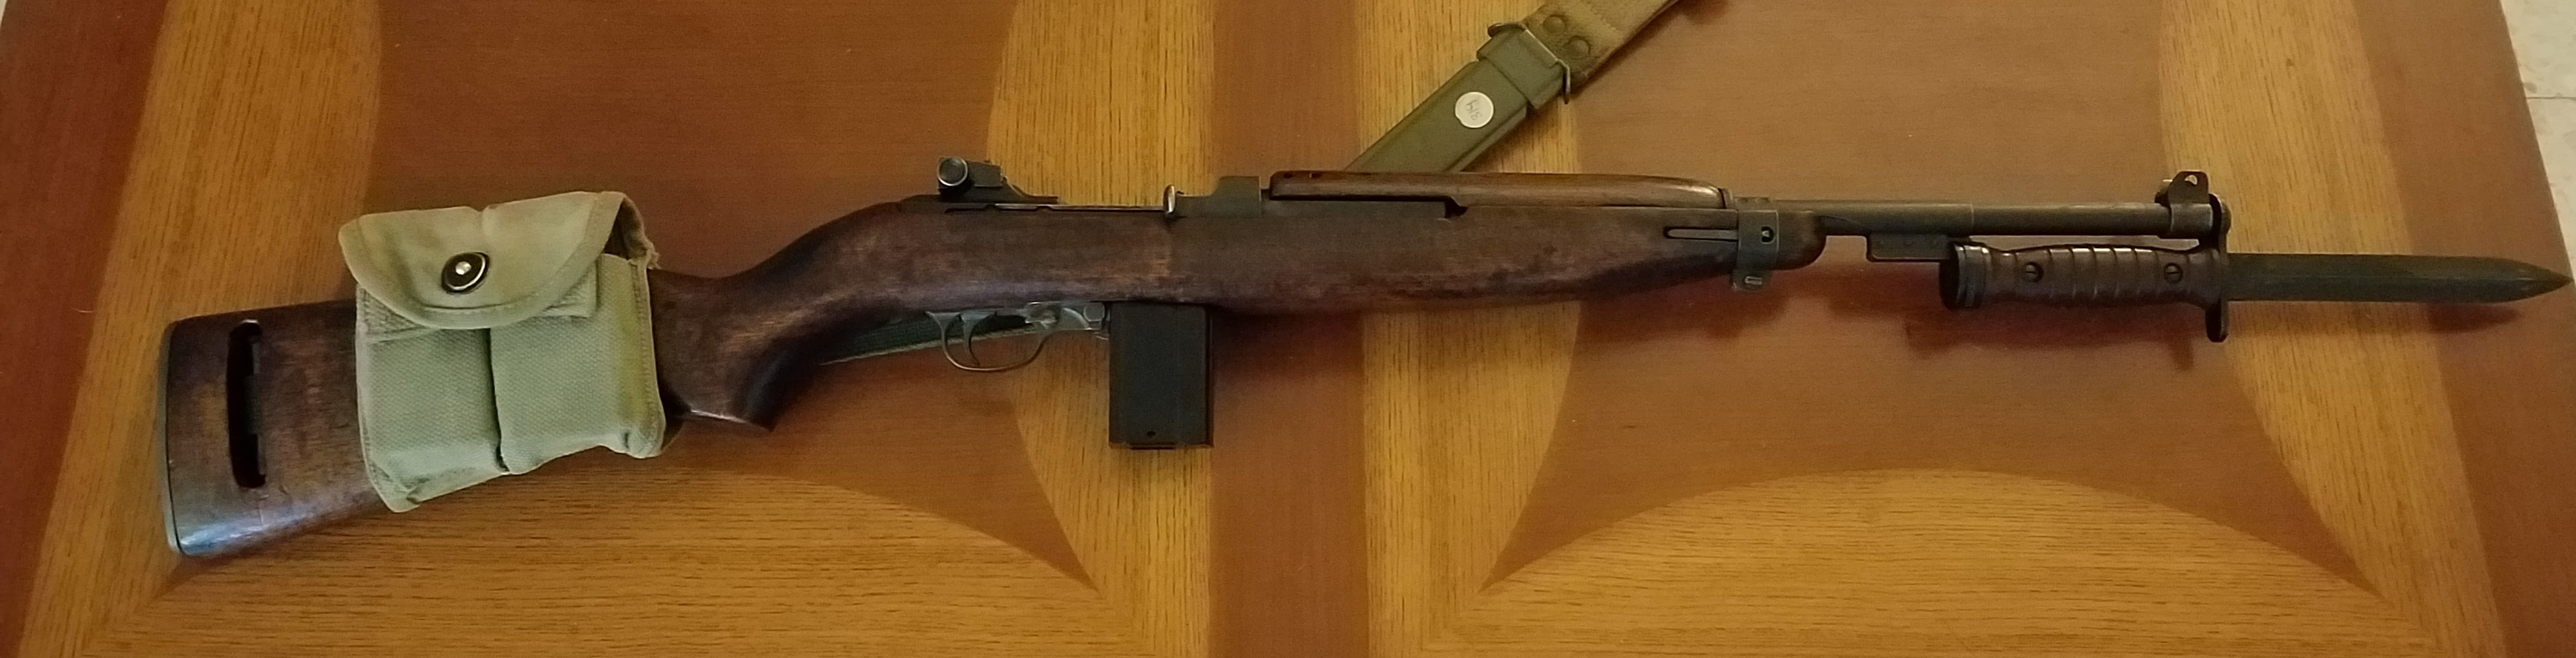 The M1 Carbine I Cherry Picked-20190304_192315.jpg